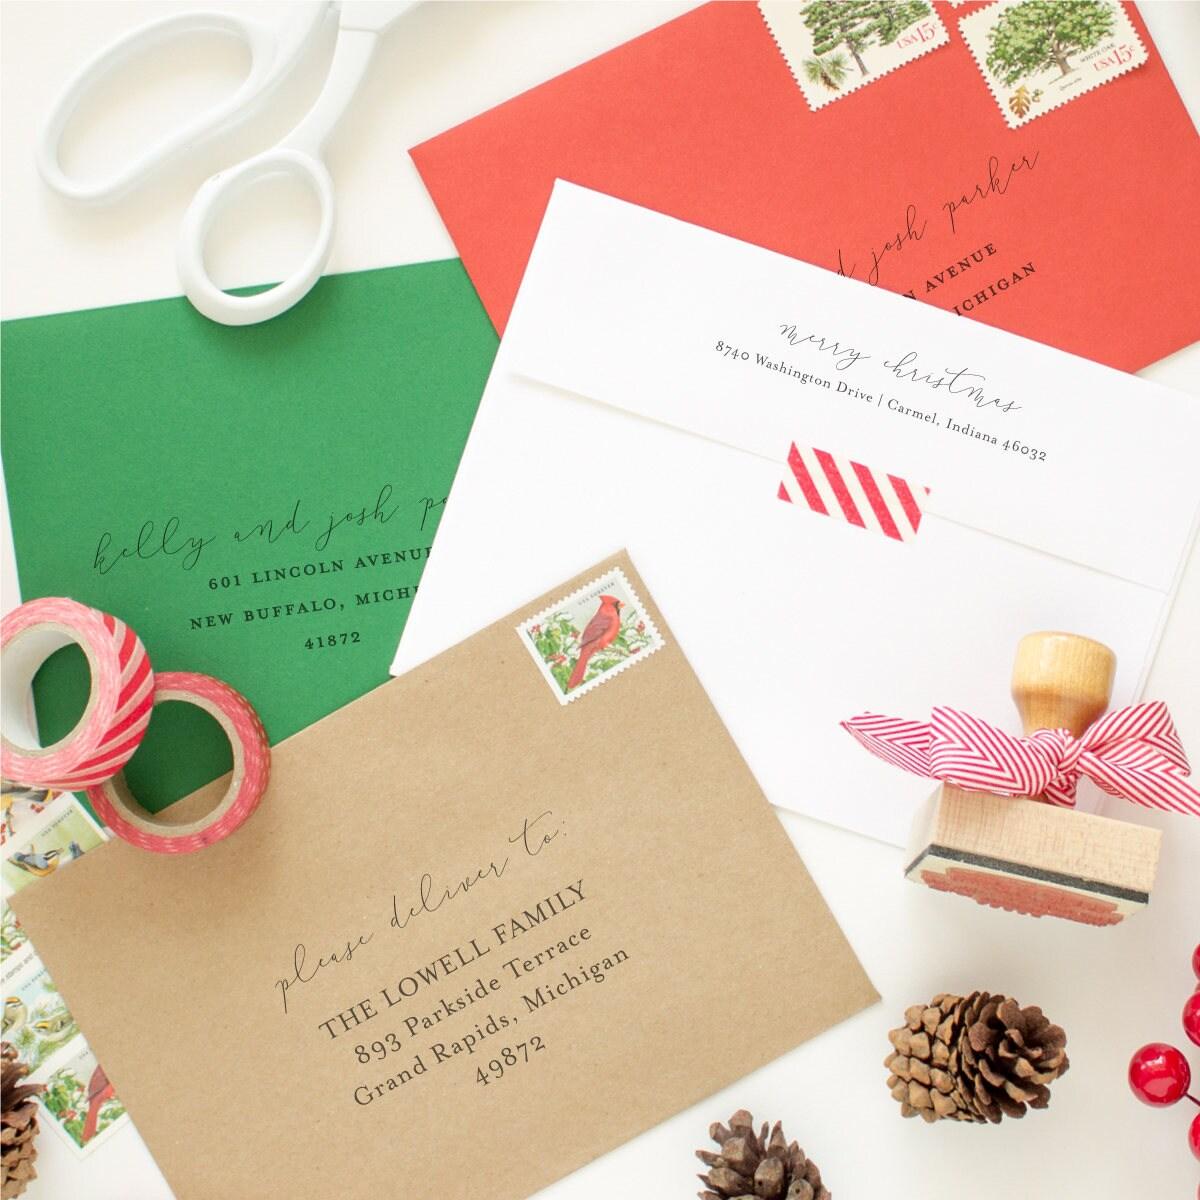 return address and mailing address printing for your christmas cards - Mailing Christmas Cards